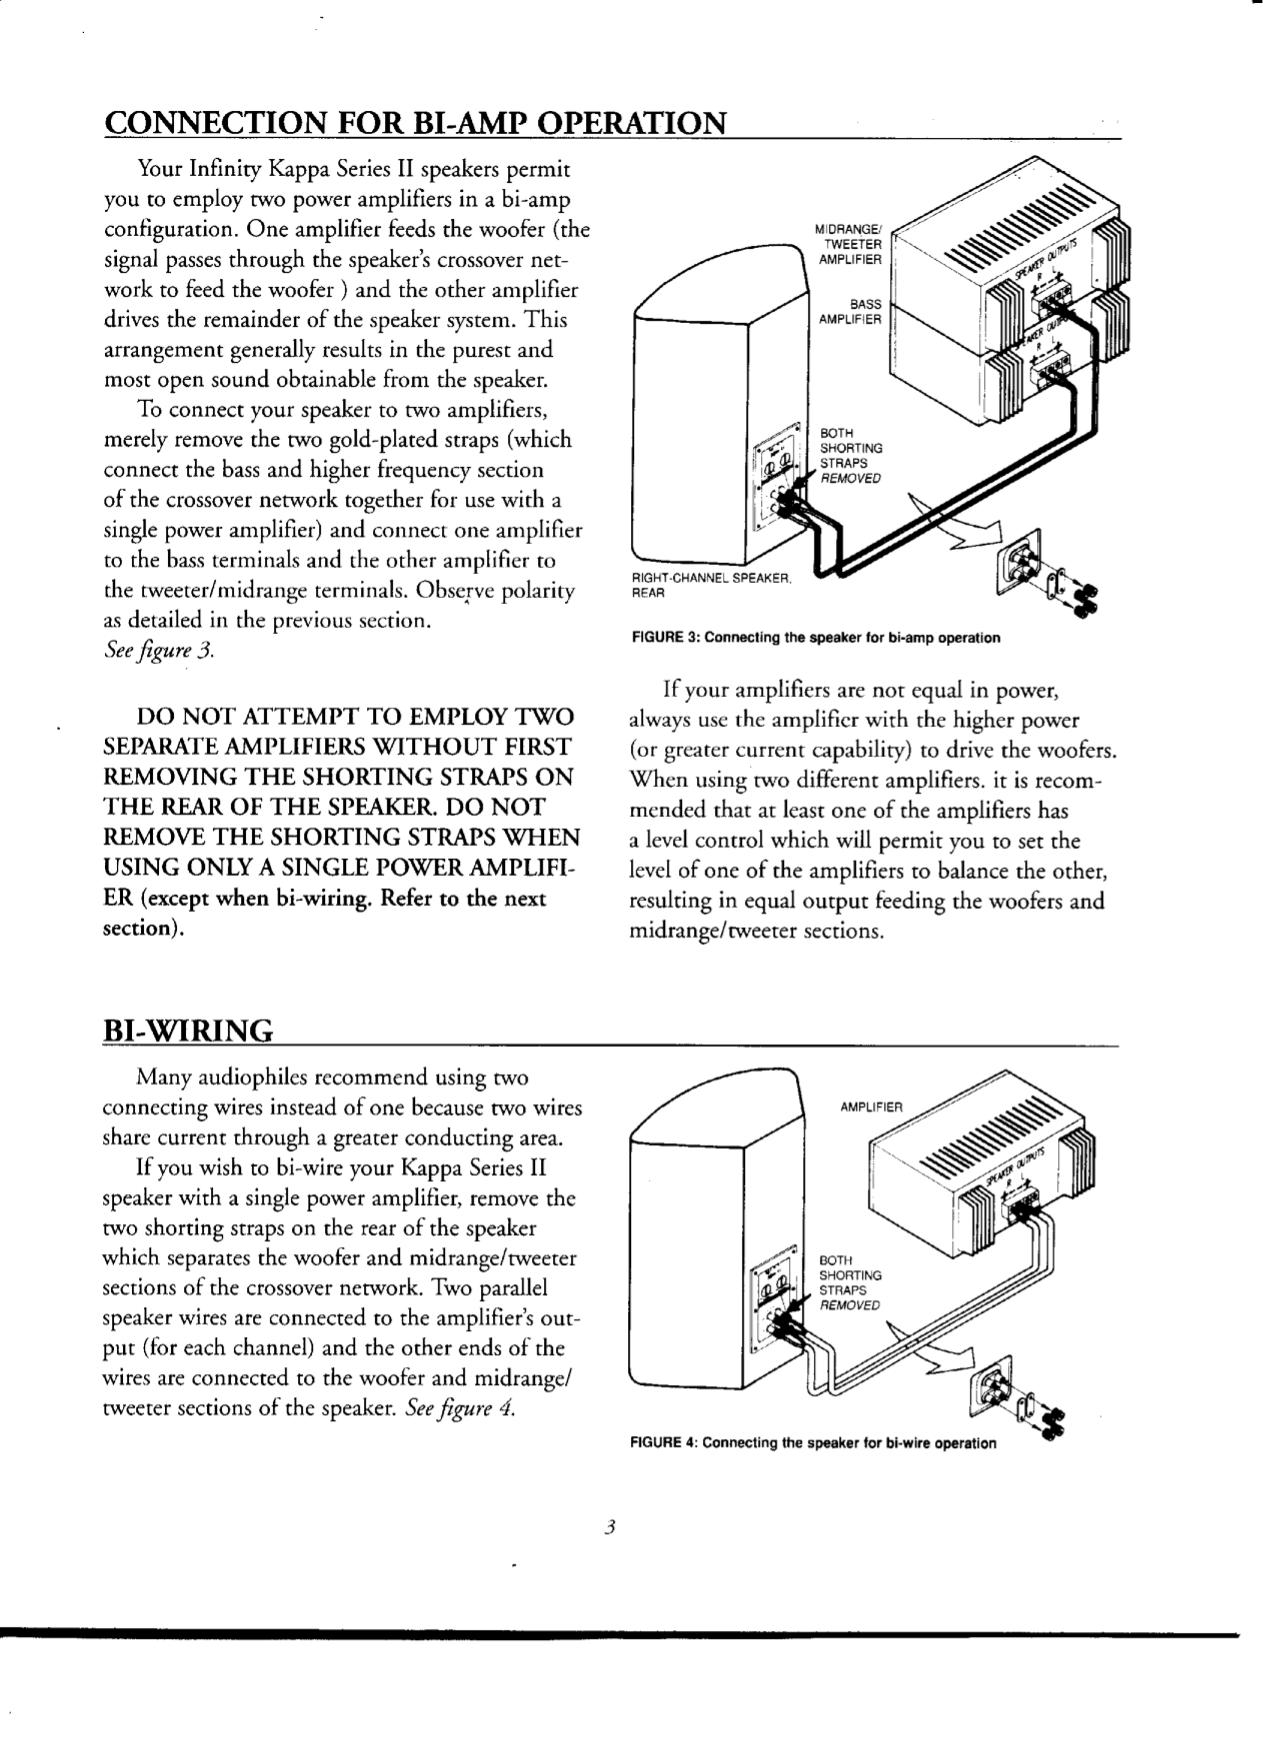 pdf manual for infinity car amplifier kappa series kappa one rh umlib com Online User Guide User Guide Template